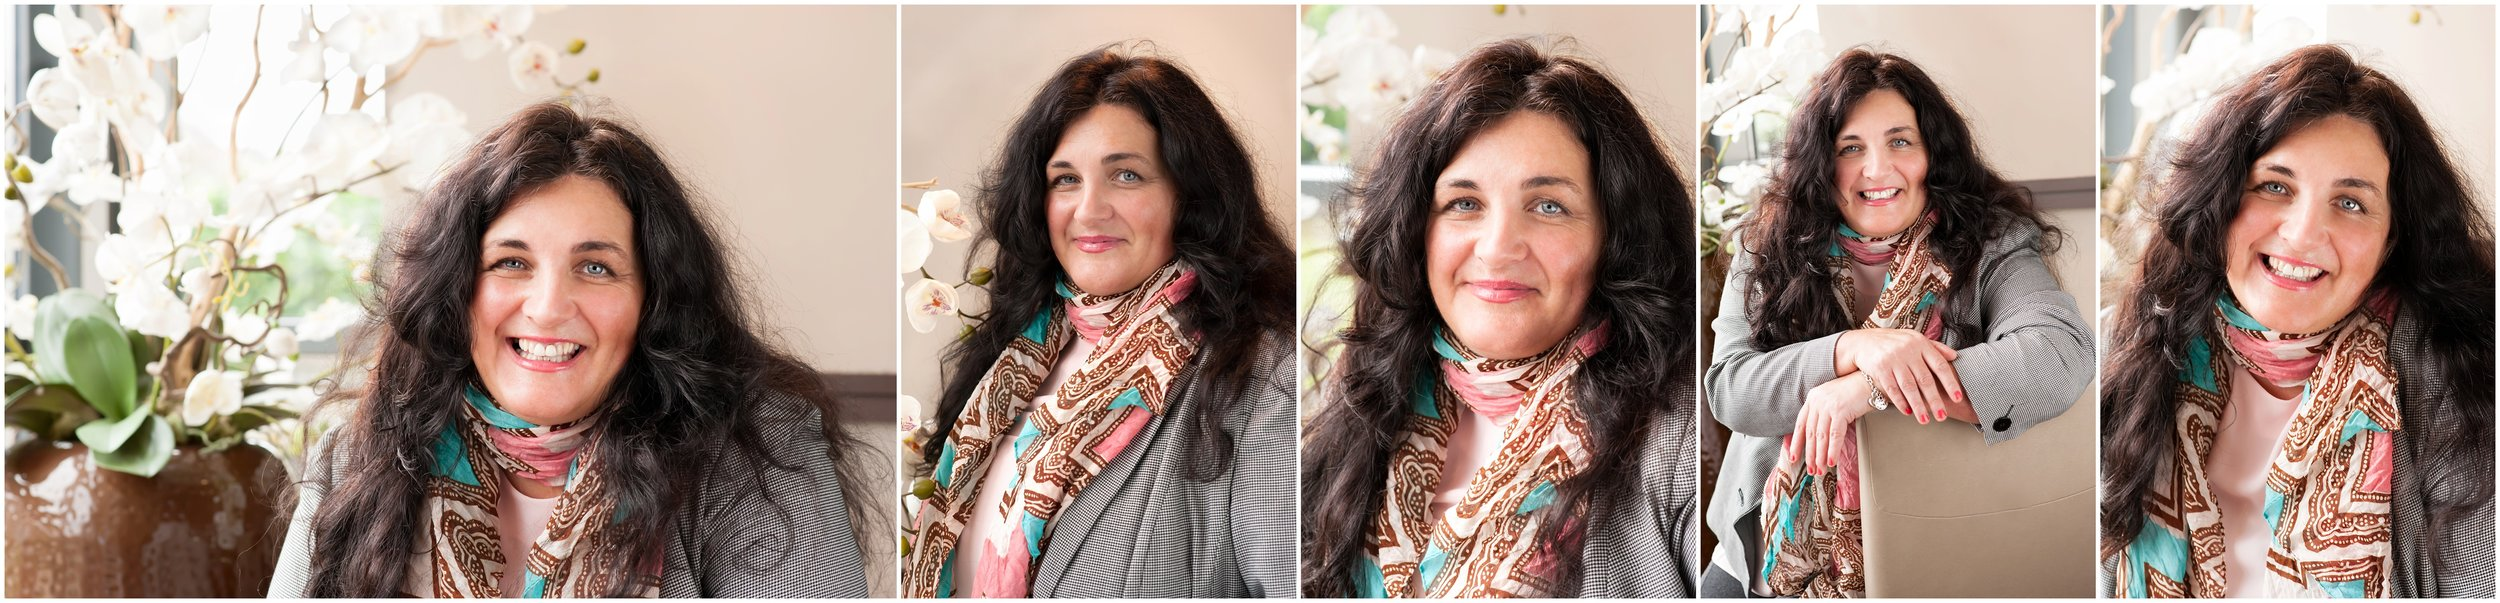 Jacquelyn Haley , owner at Viva La Vida Hypnotherapy & Holistic Health.  www.jacquelyn-haley.co.uk   vivabusiness1@gmail.com  tel -07534 387774